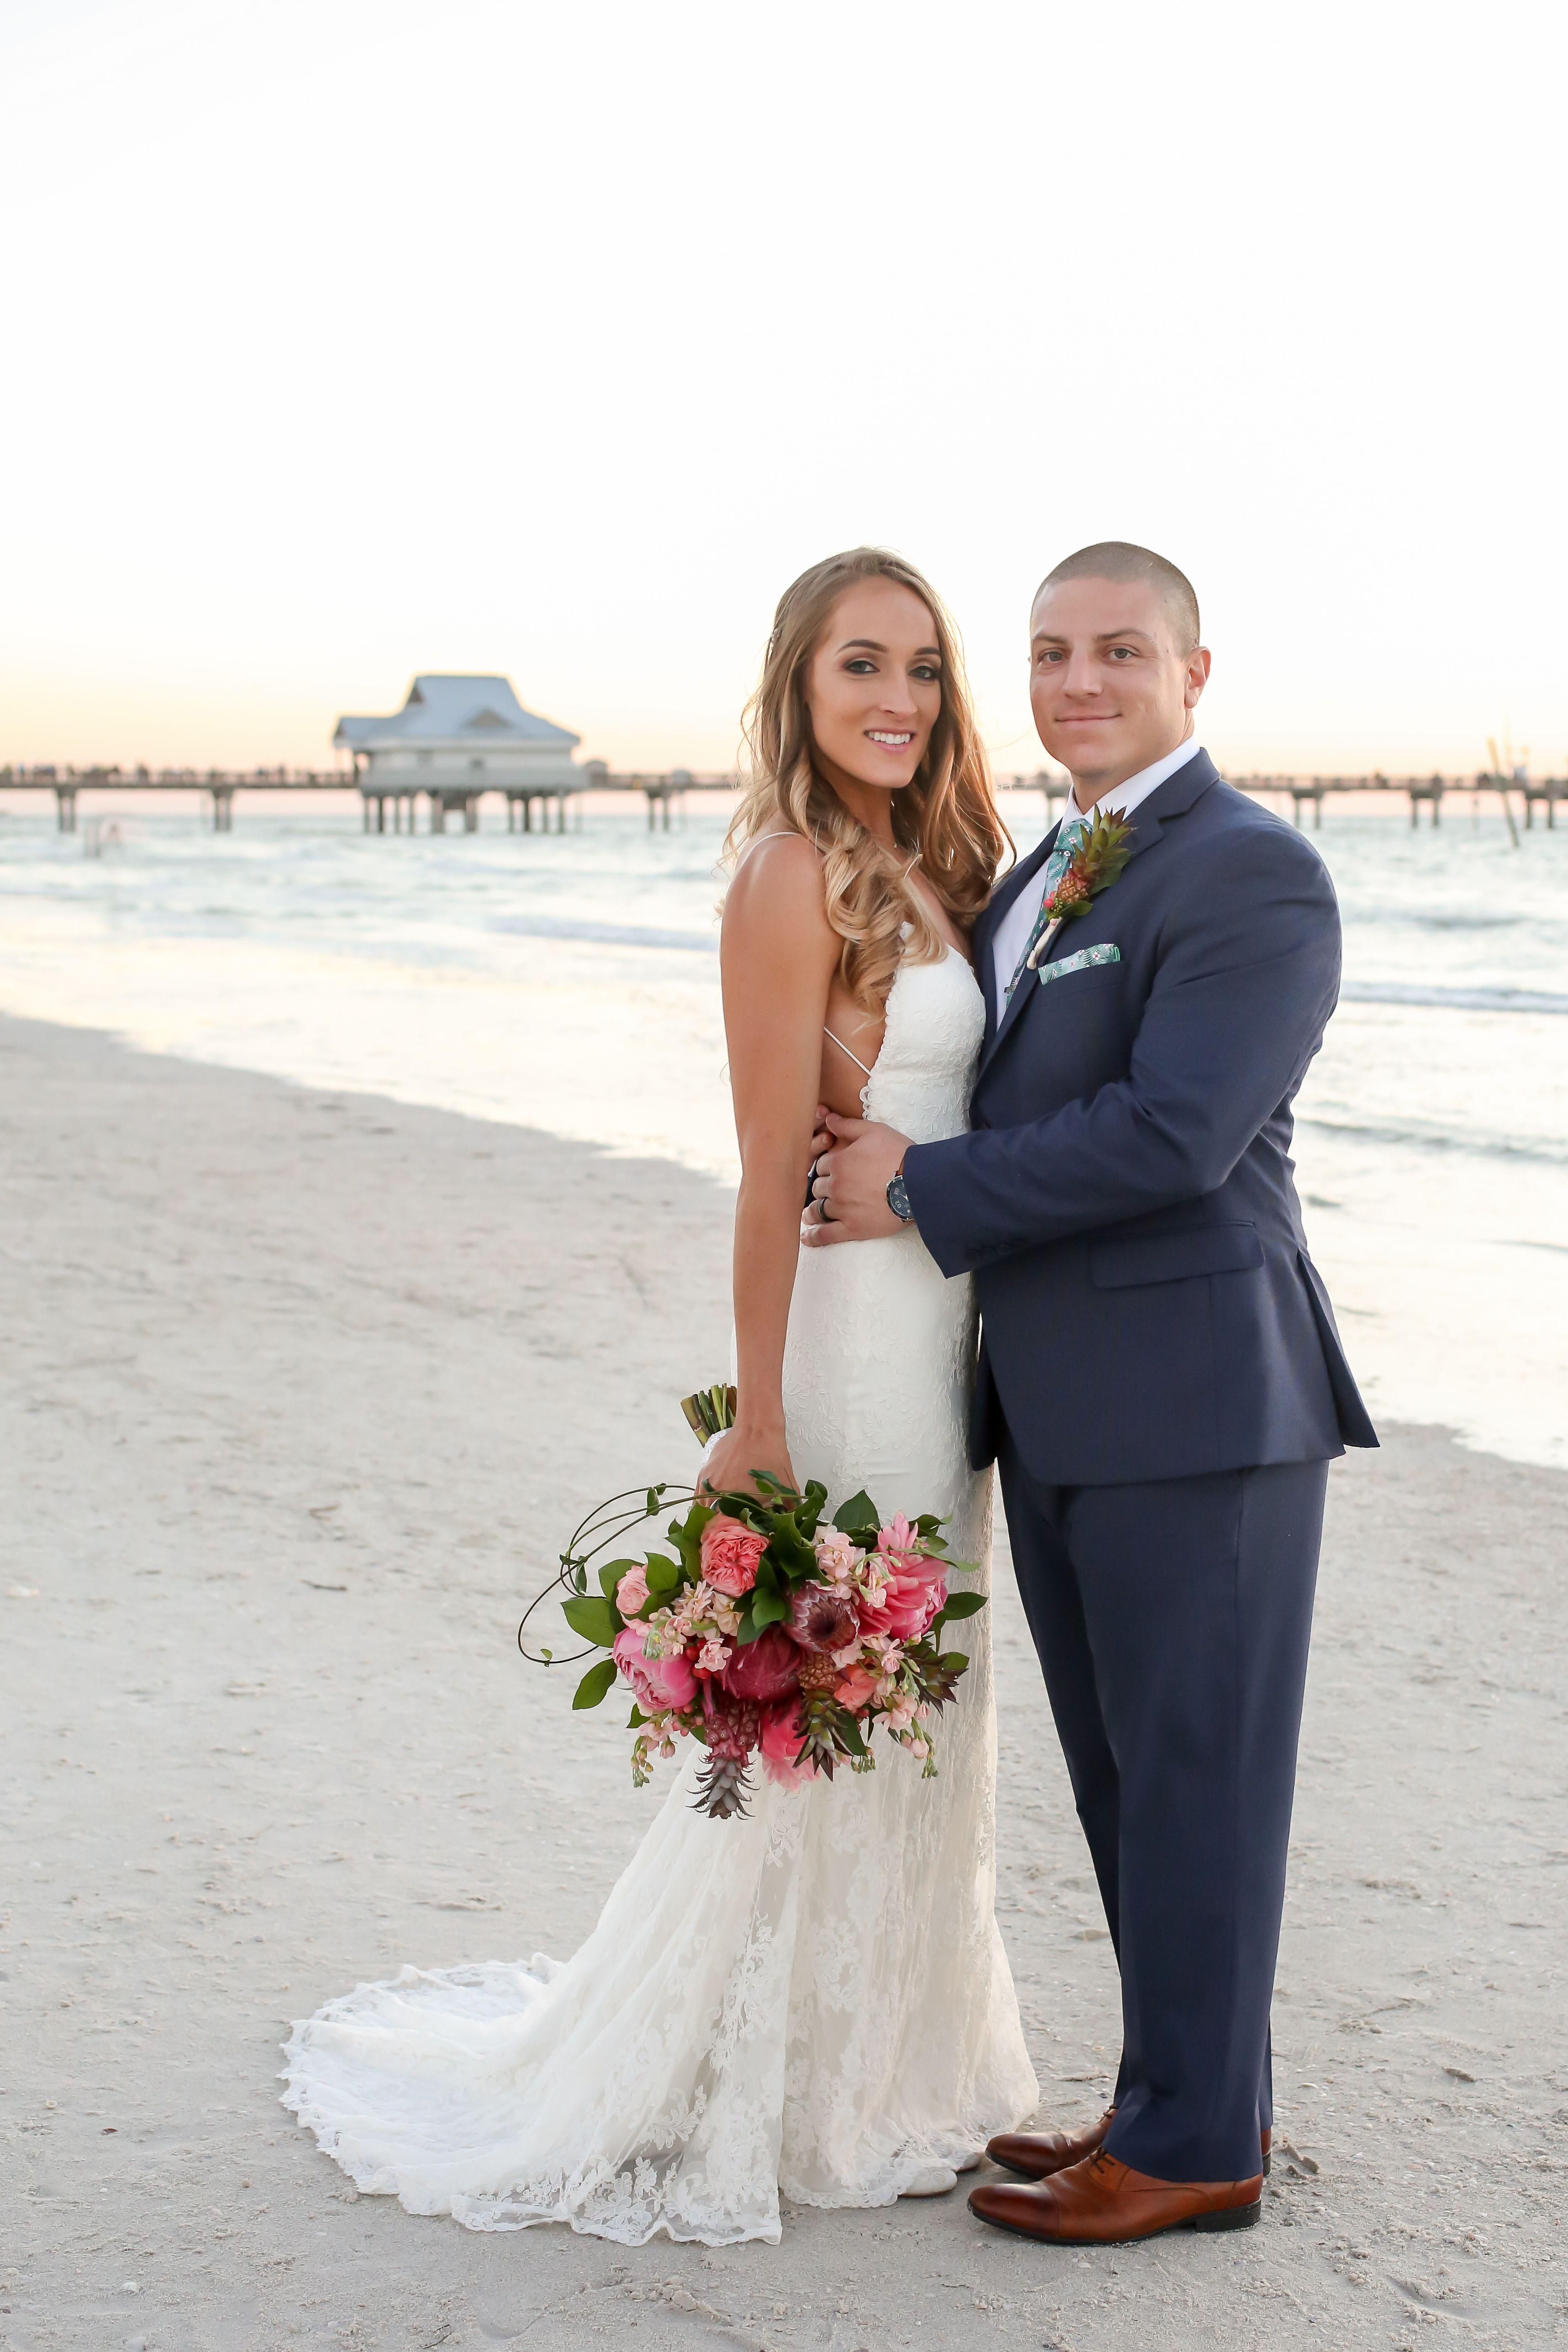 Hilton Clearwater Beach Resort & Spa Sunset beach